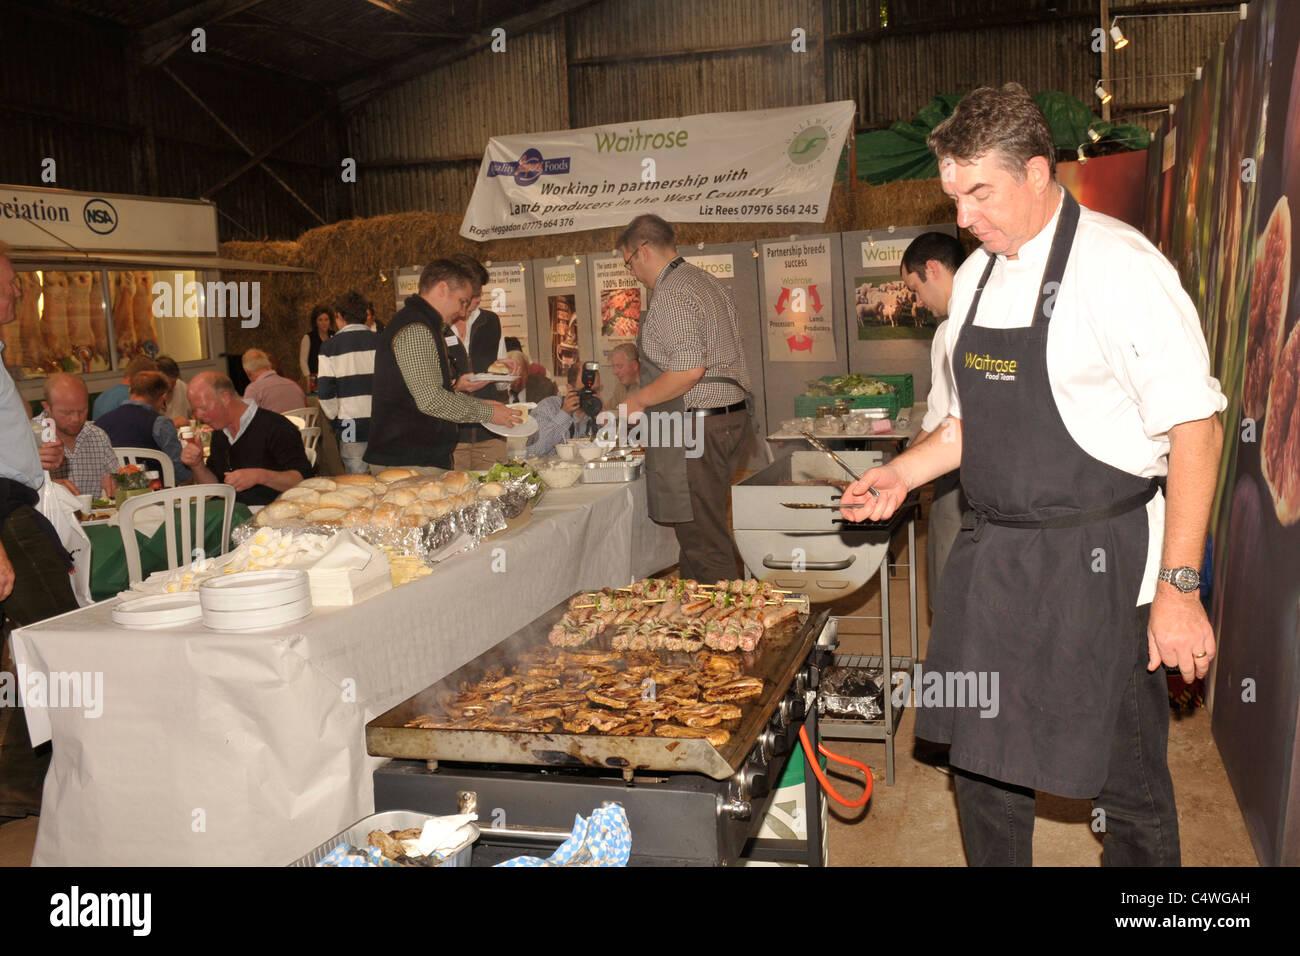 waitrose chefs on BBQ - Stock Image